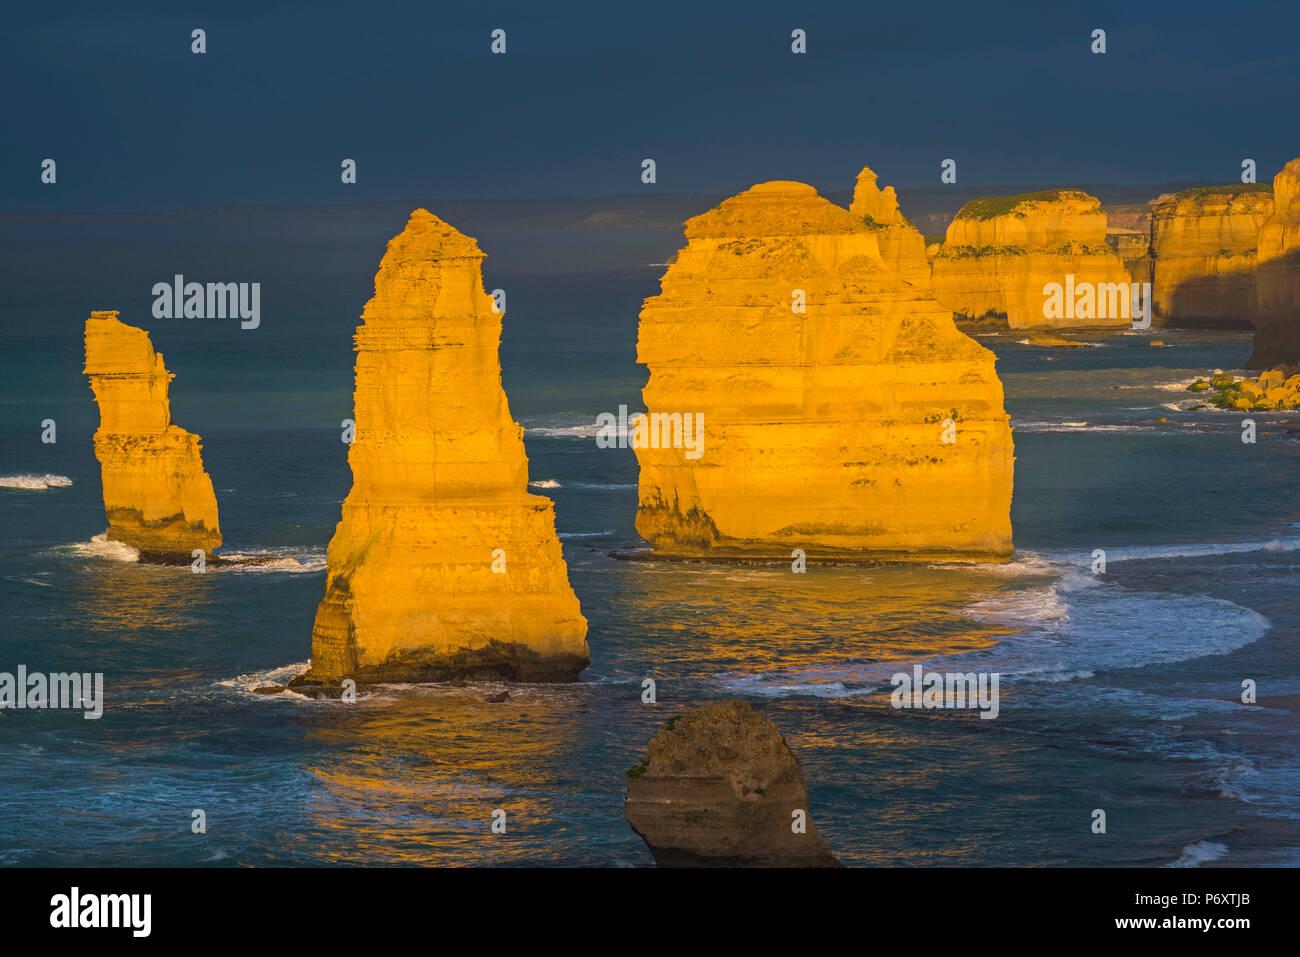 Die zwölf Apostel, Port Campbell National Park, Victoria, Australien. Meer Kalkstein Stapel bei Sonnenuntergang. Stockfoto